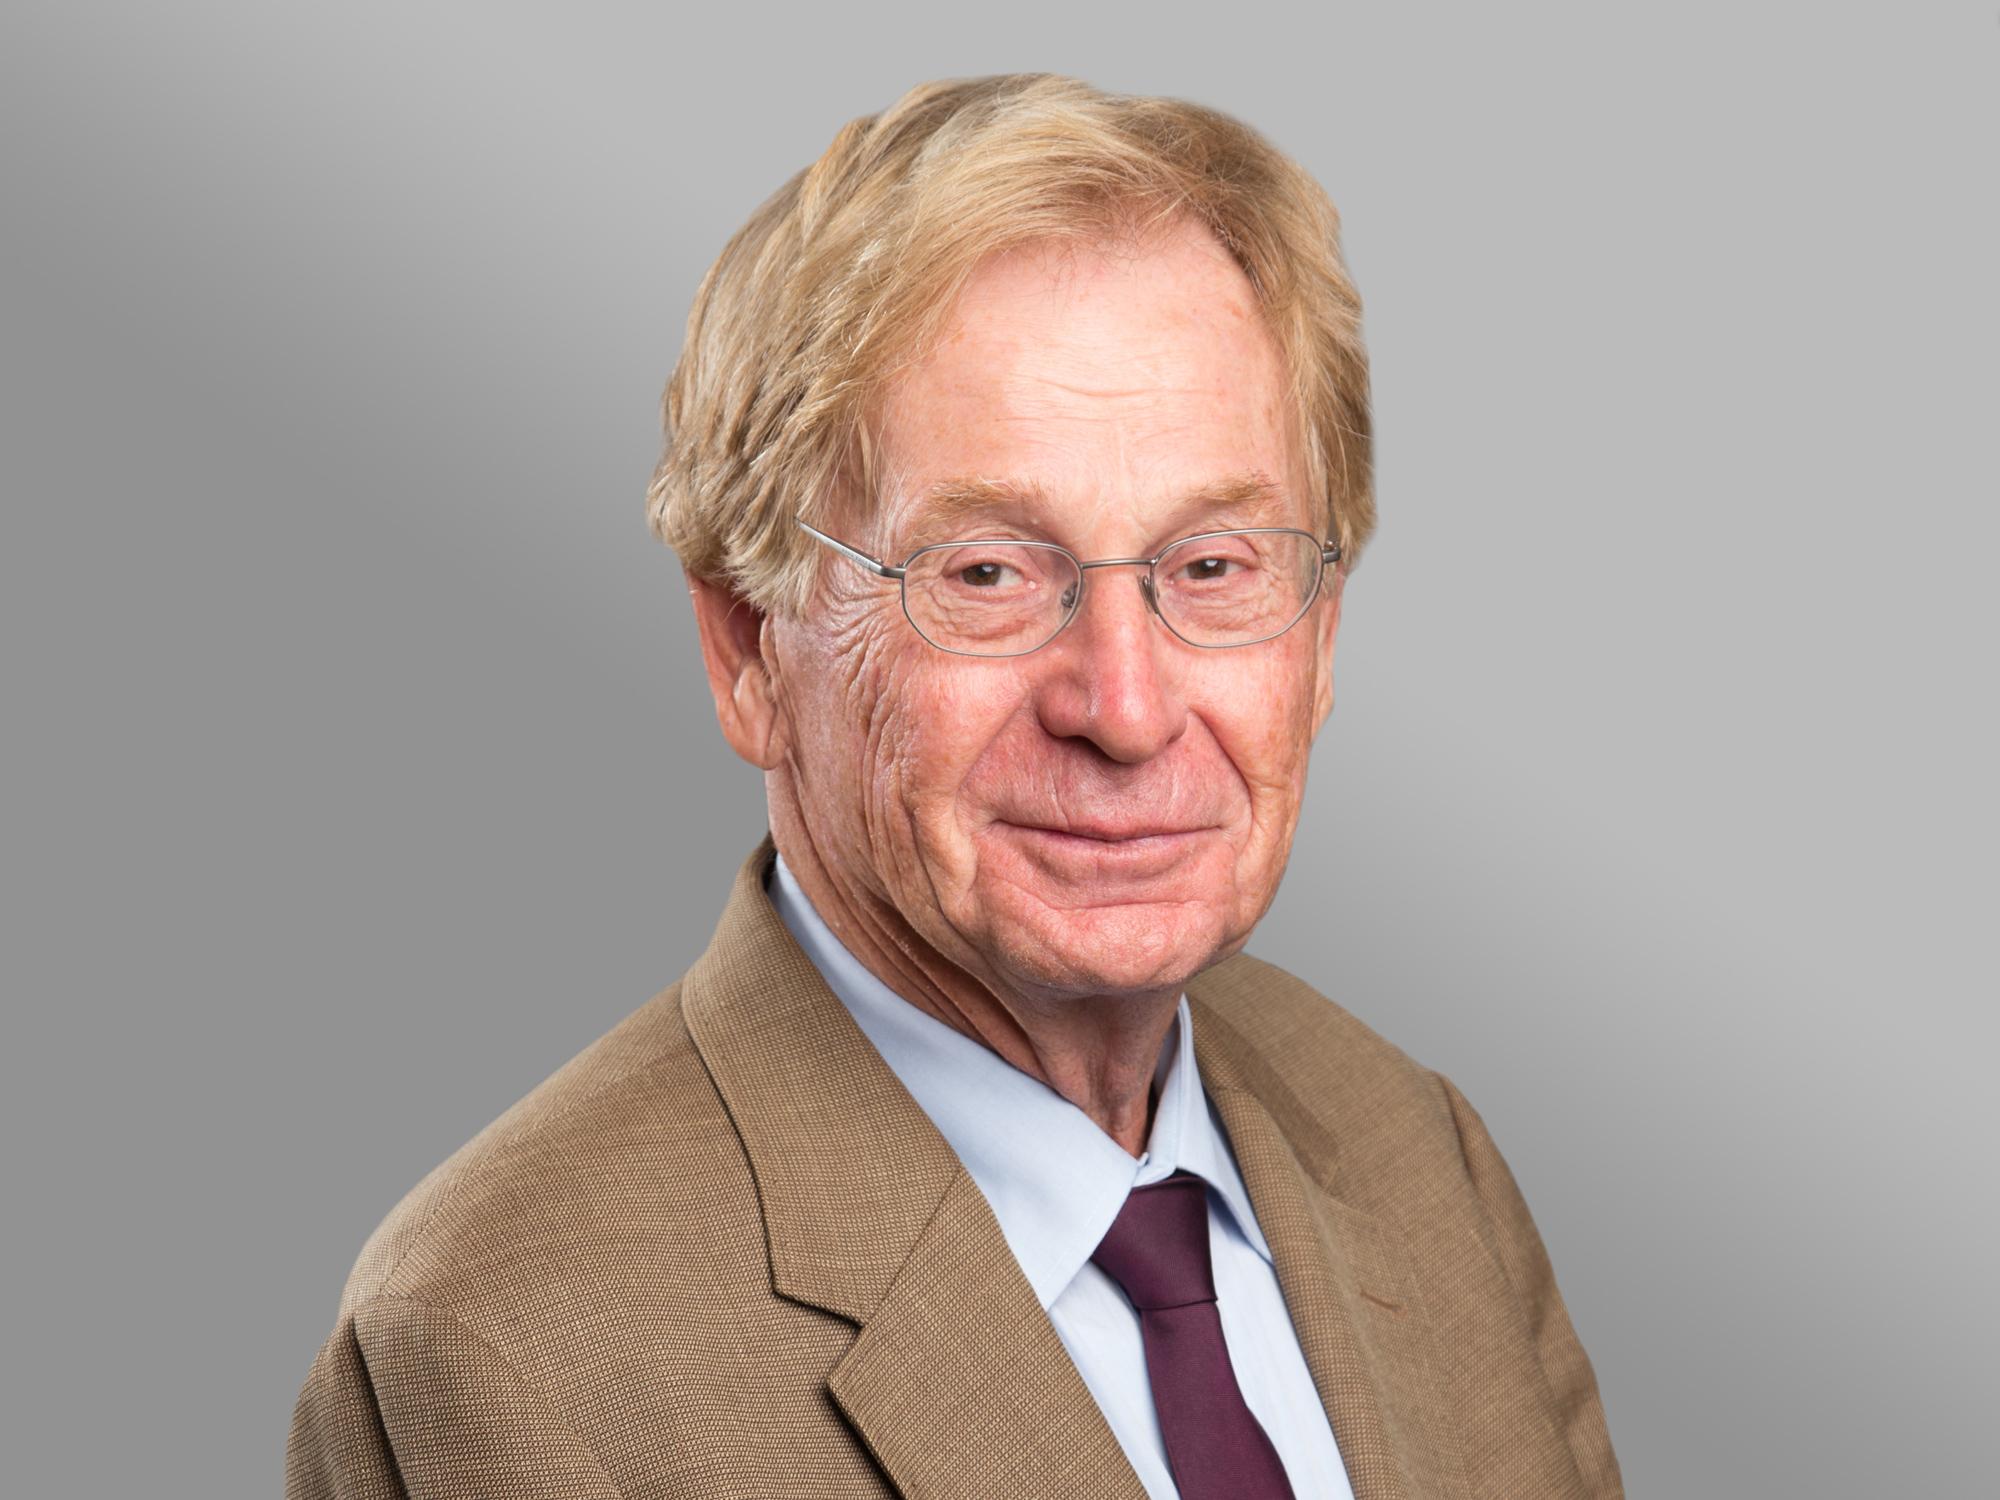 "<a href=""http://rae-seichter.webseiten.cc/anwaelte/dr-detlef-seichter/"">Dr. Detlef Seichter</a>"